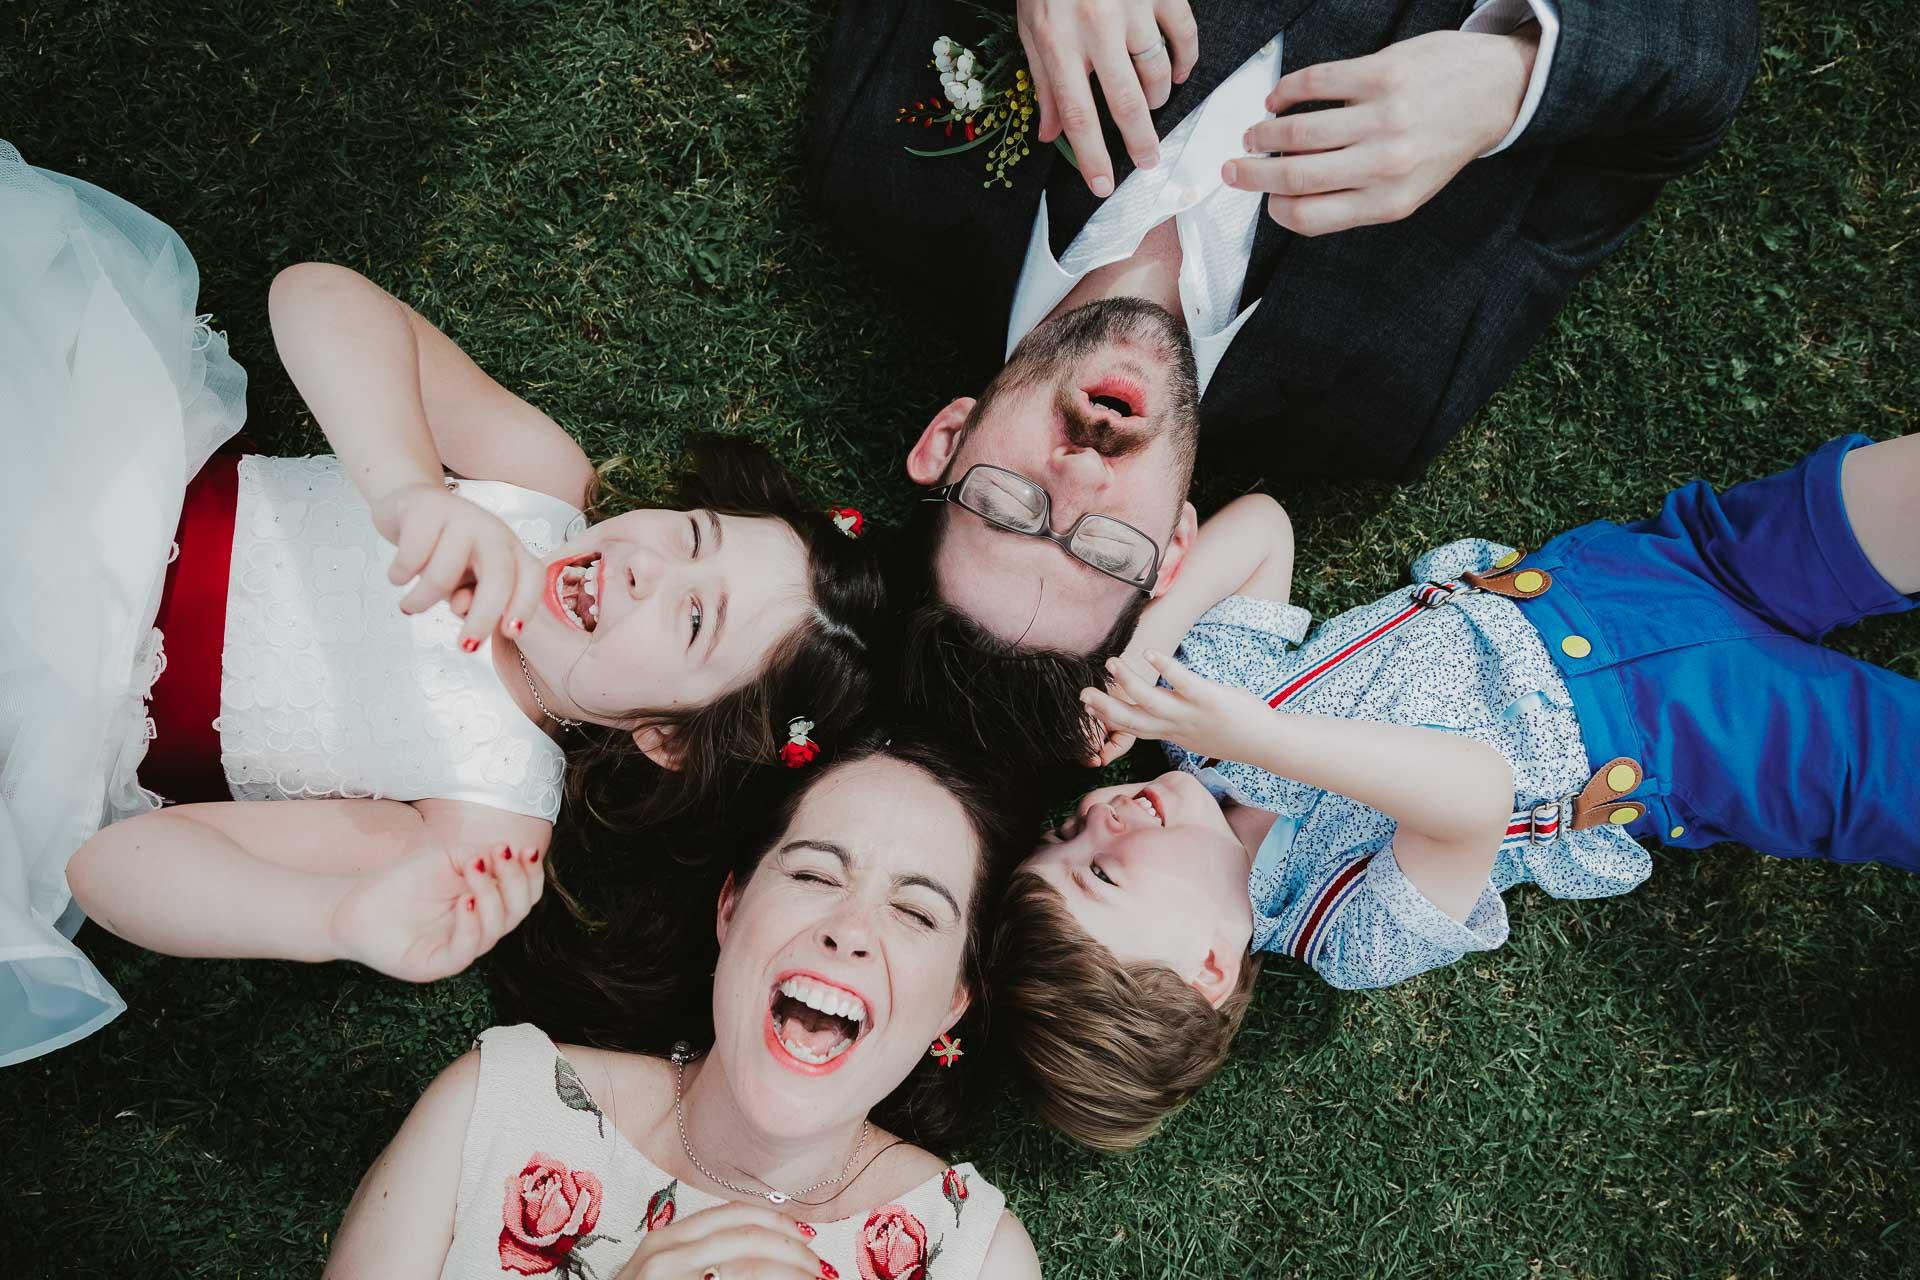 https://philippajamesphotography.com › inviting-children-to-your-wedding